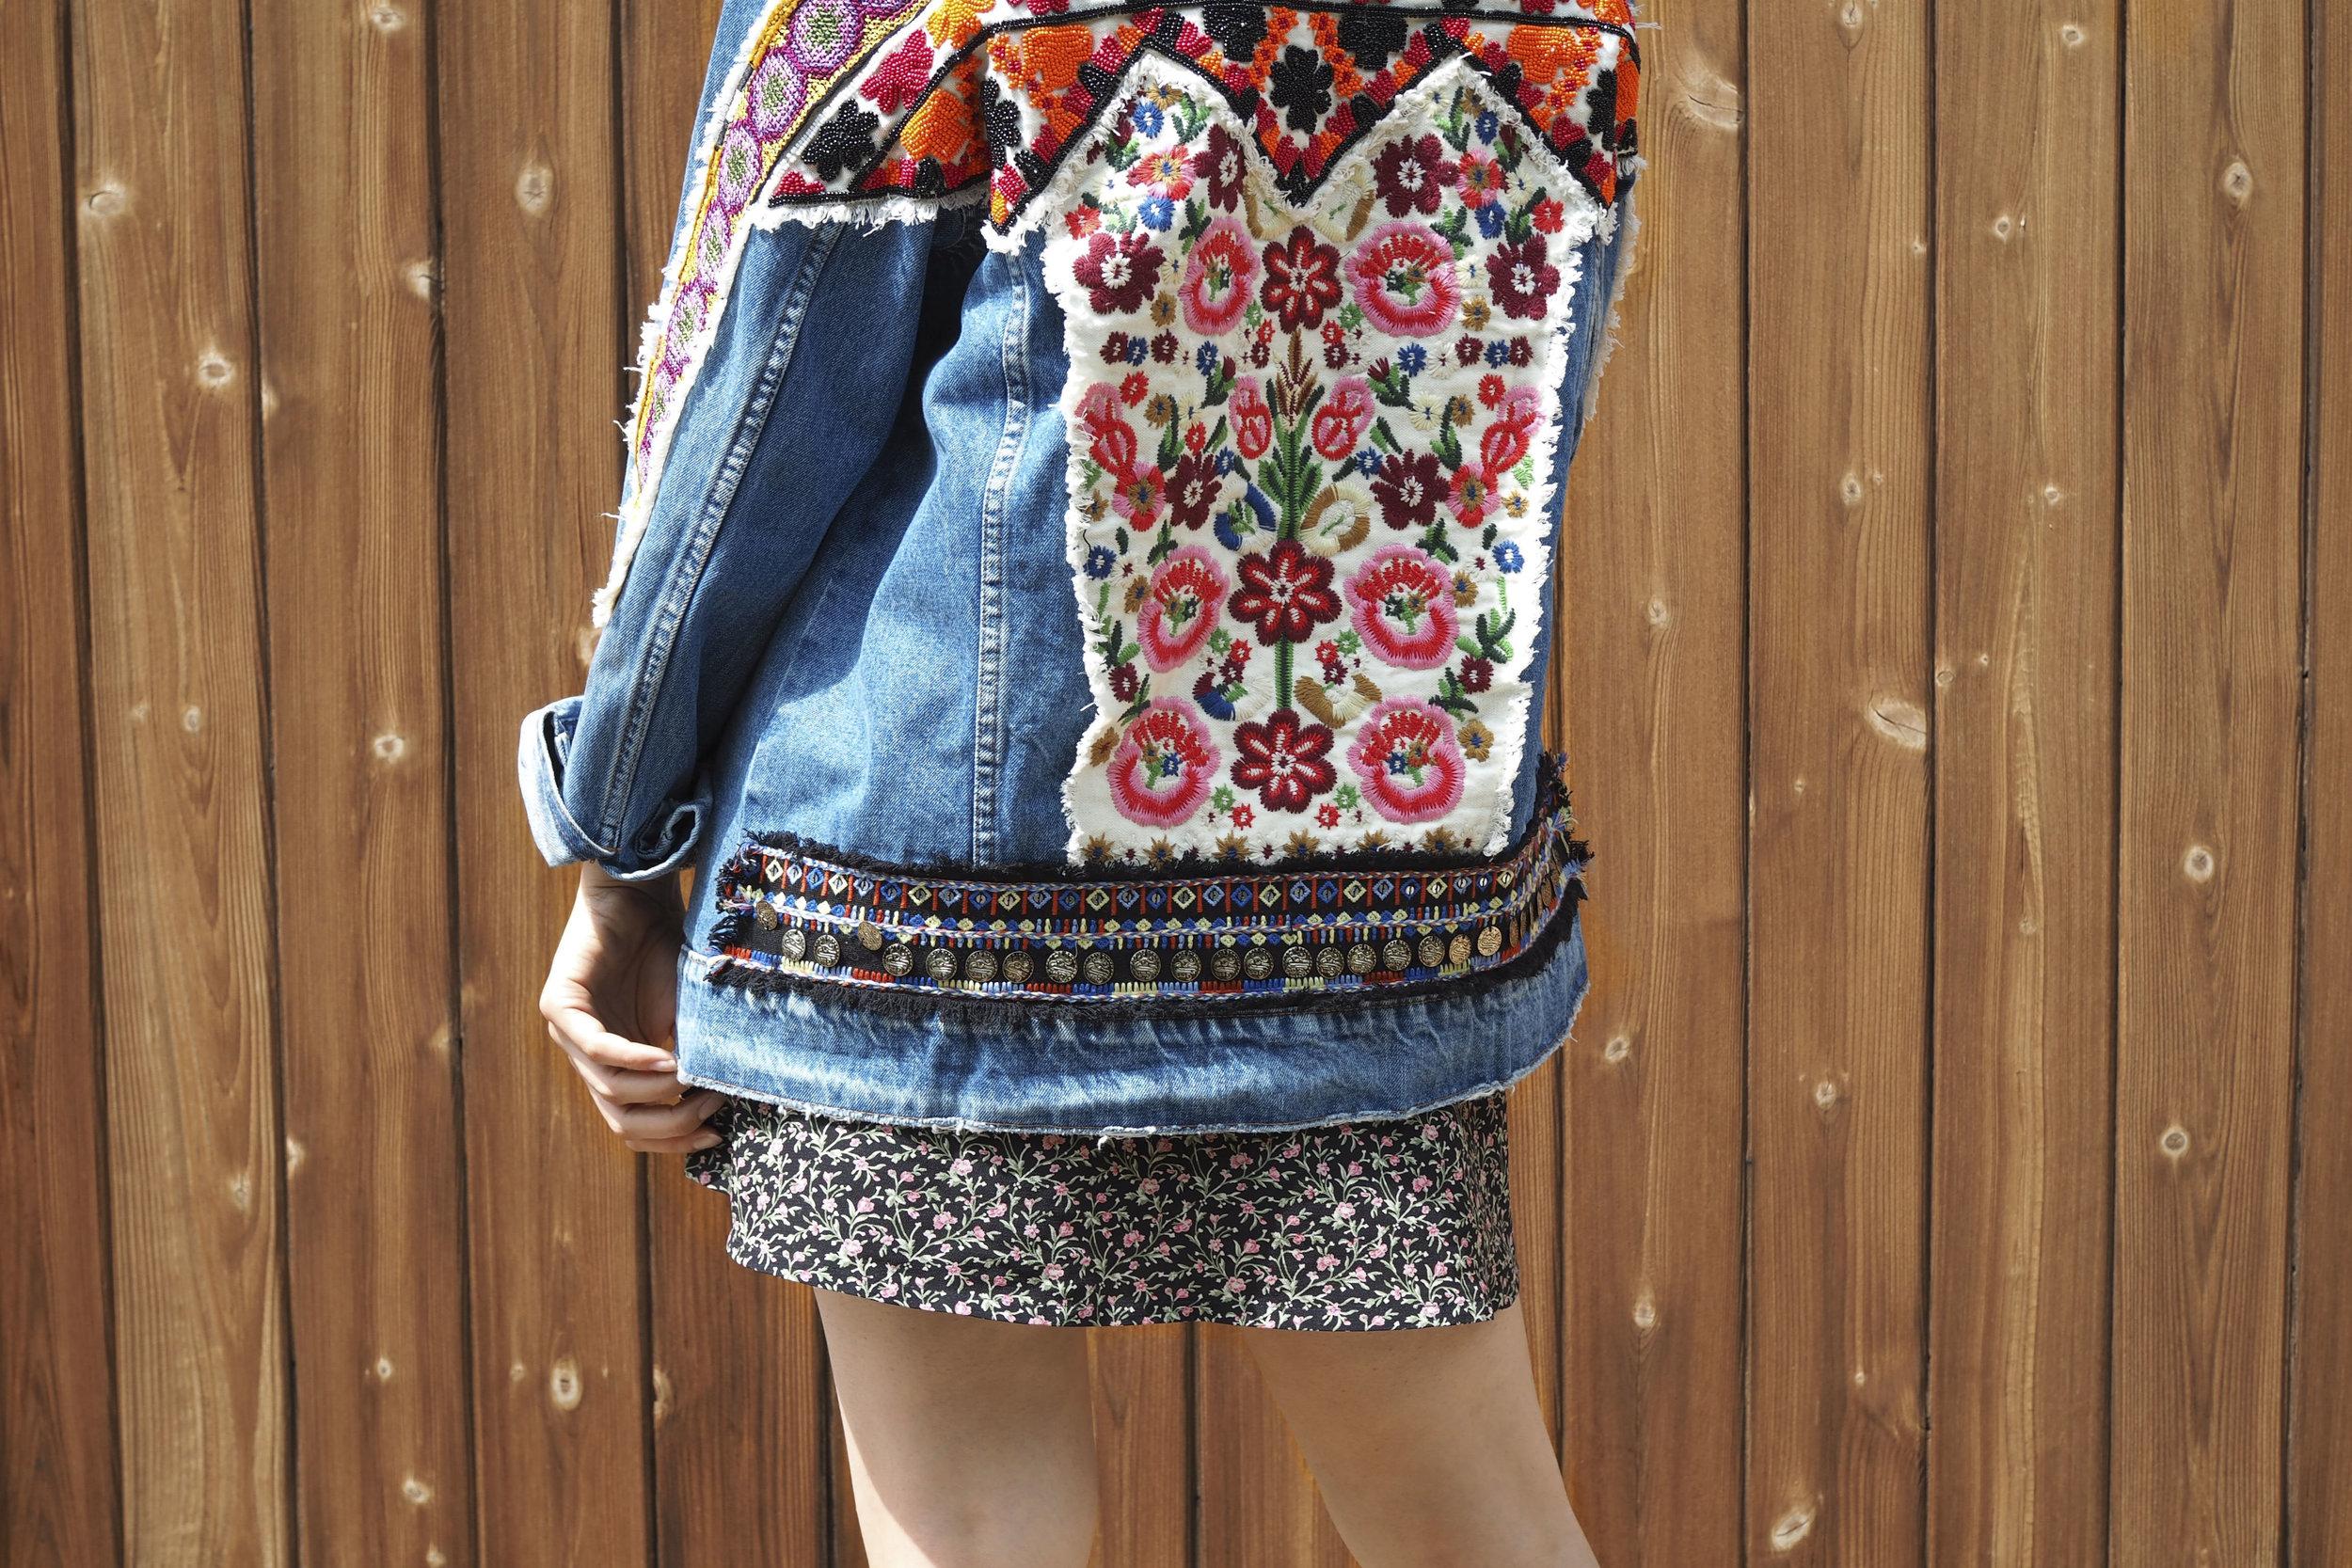 Zara Jacket, Agnes B. Skirt and Top.